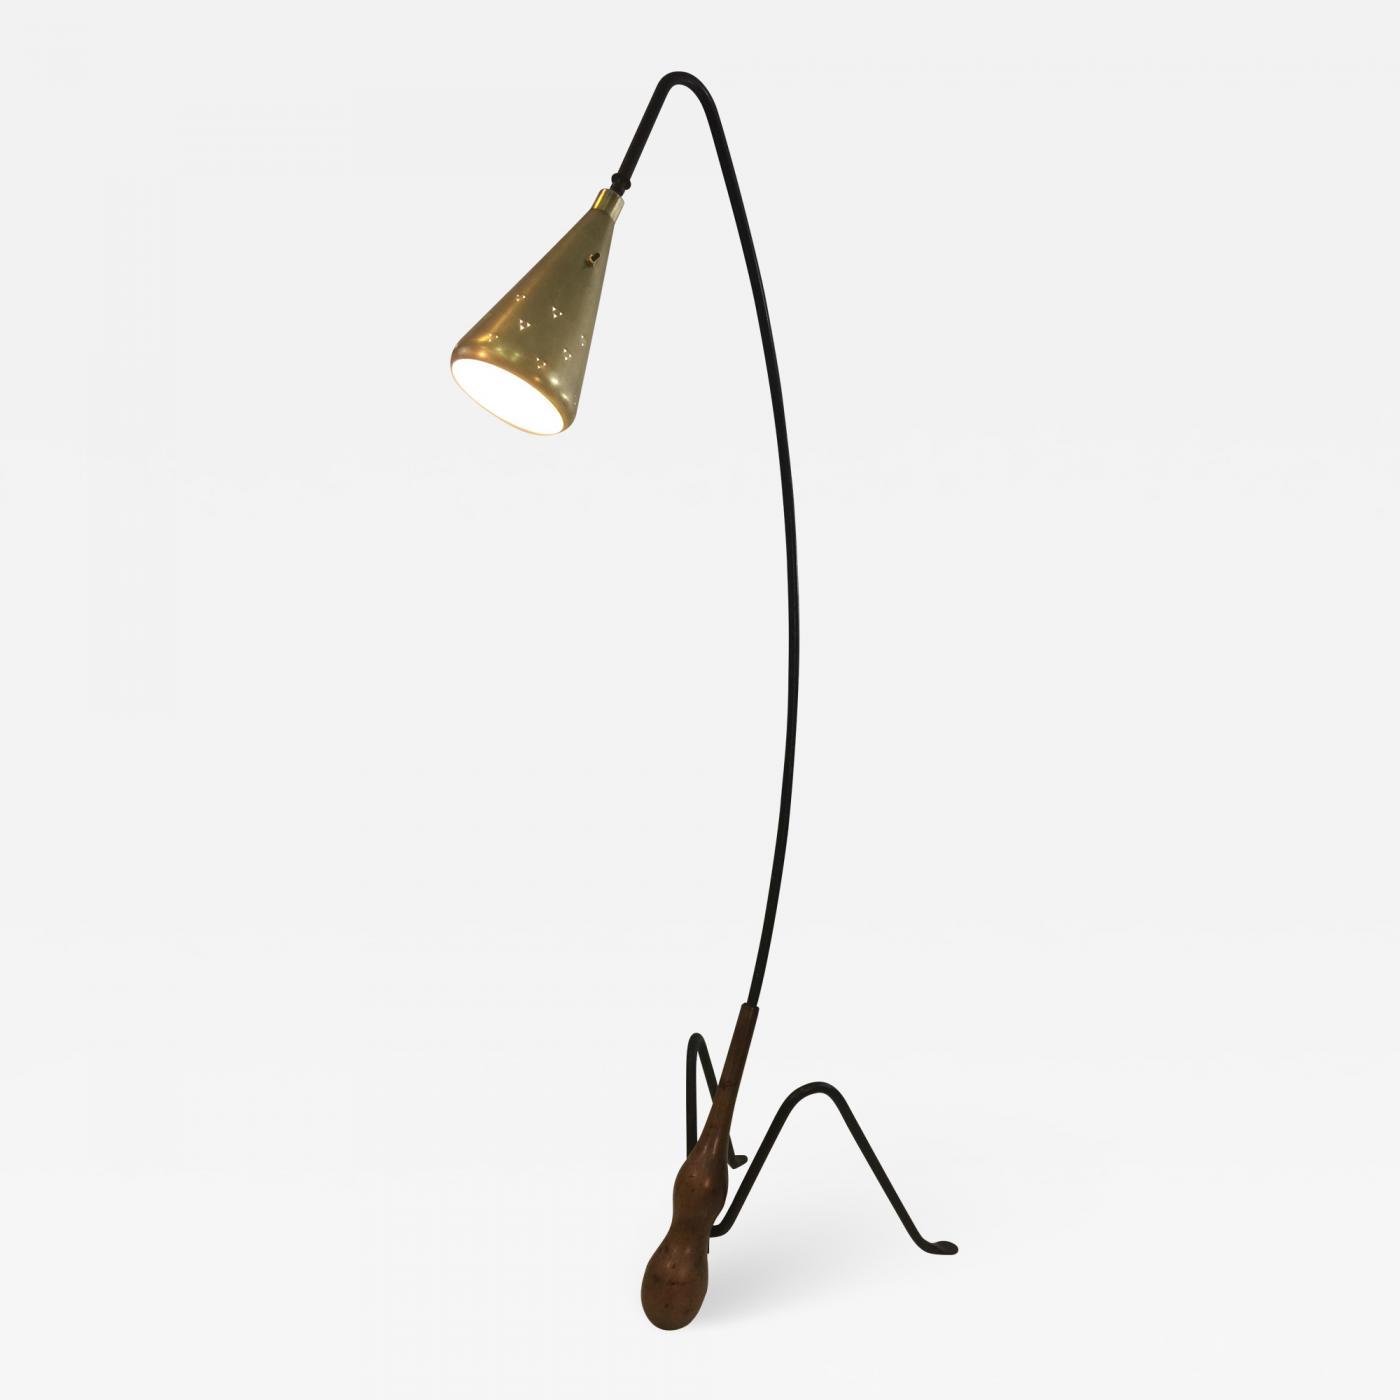 Greta Magnusson Grossman Superb Mid Century Modernist Floor Lamp Attributed To Greta Grossman